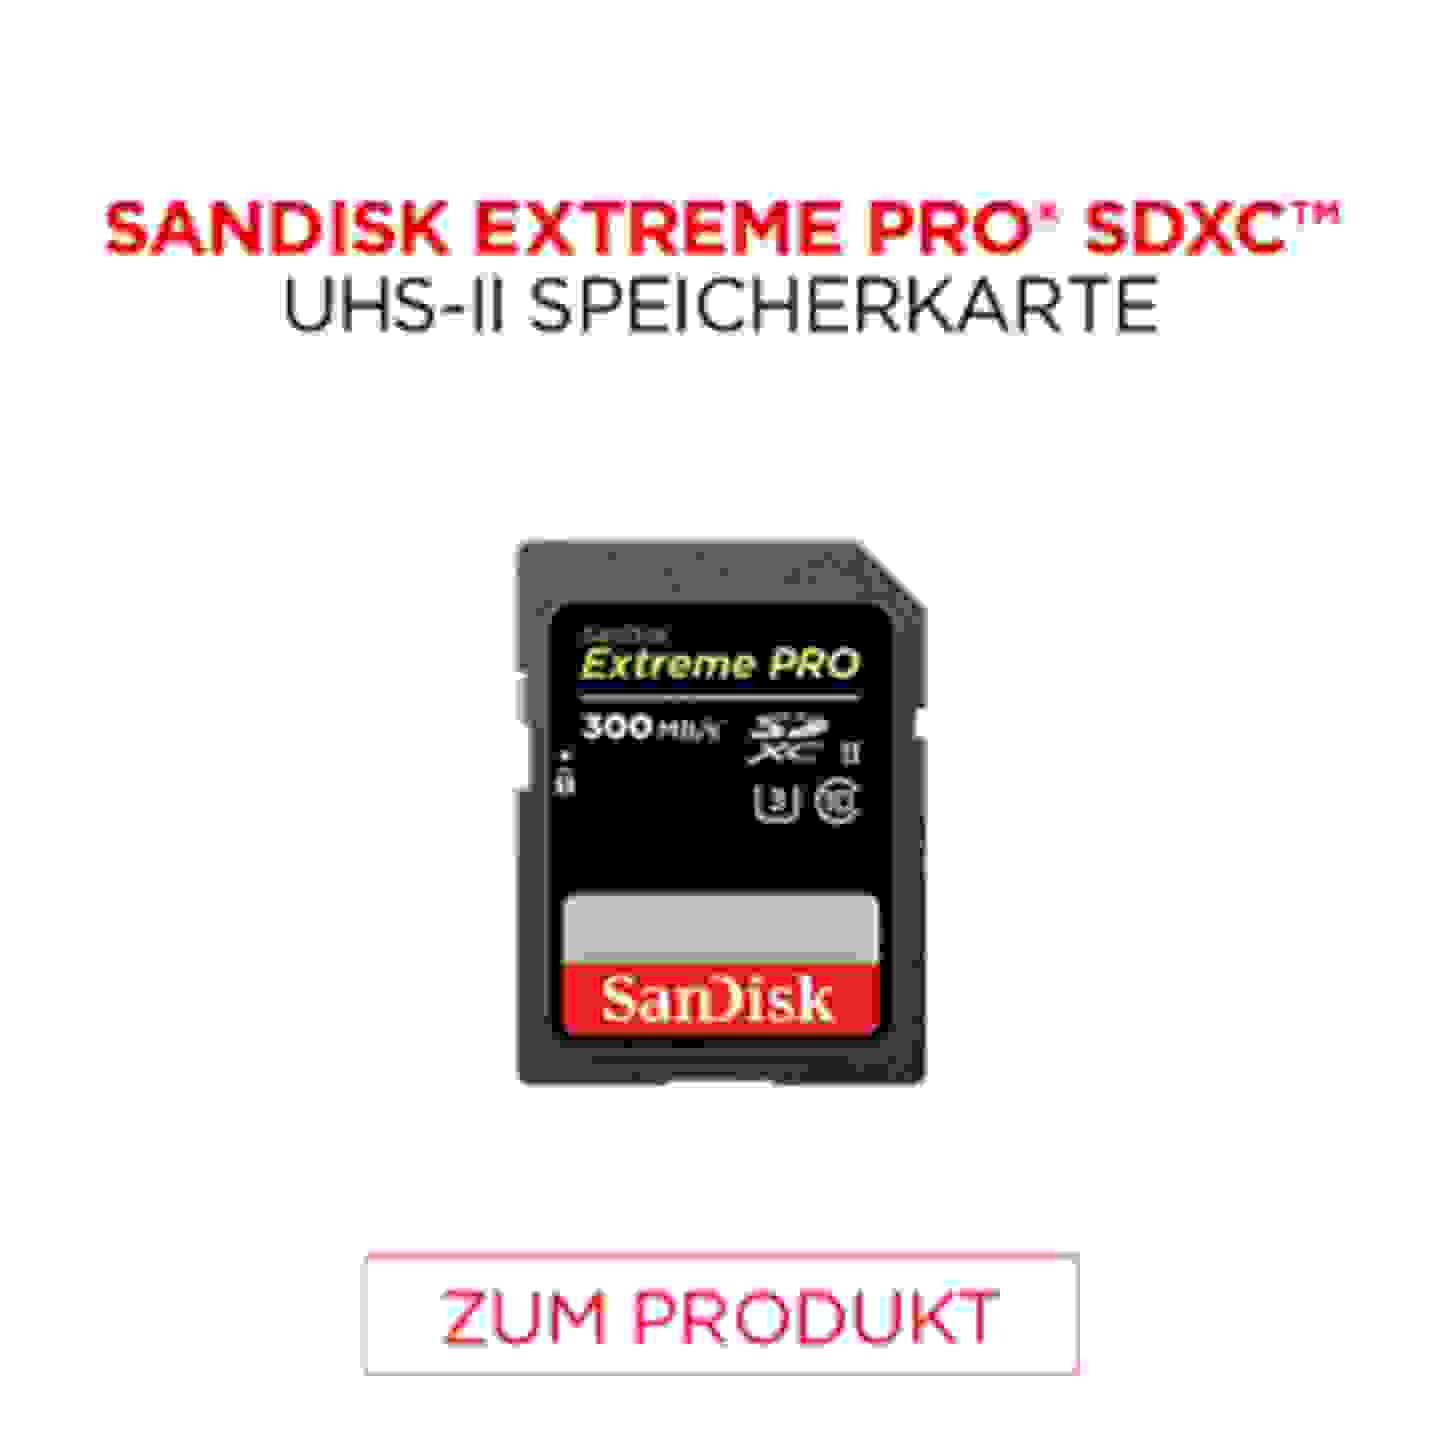 Sandisk Extreme Pro SDXC UHS Speicherkarte